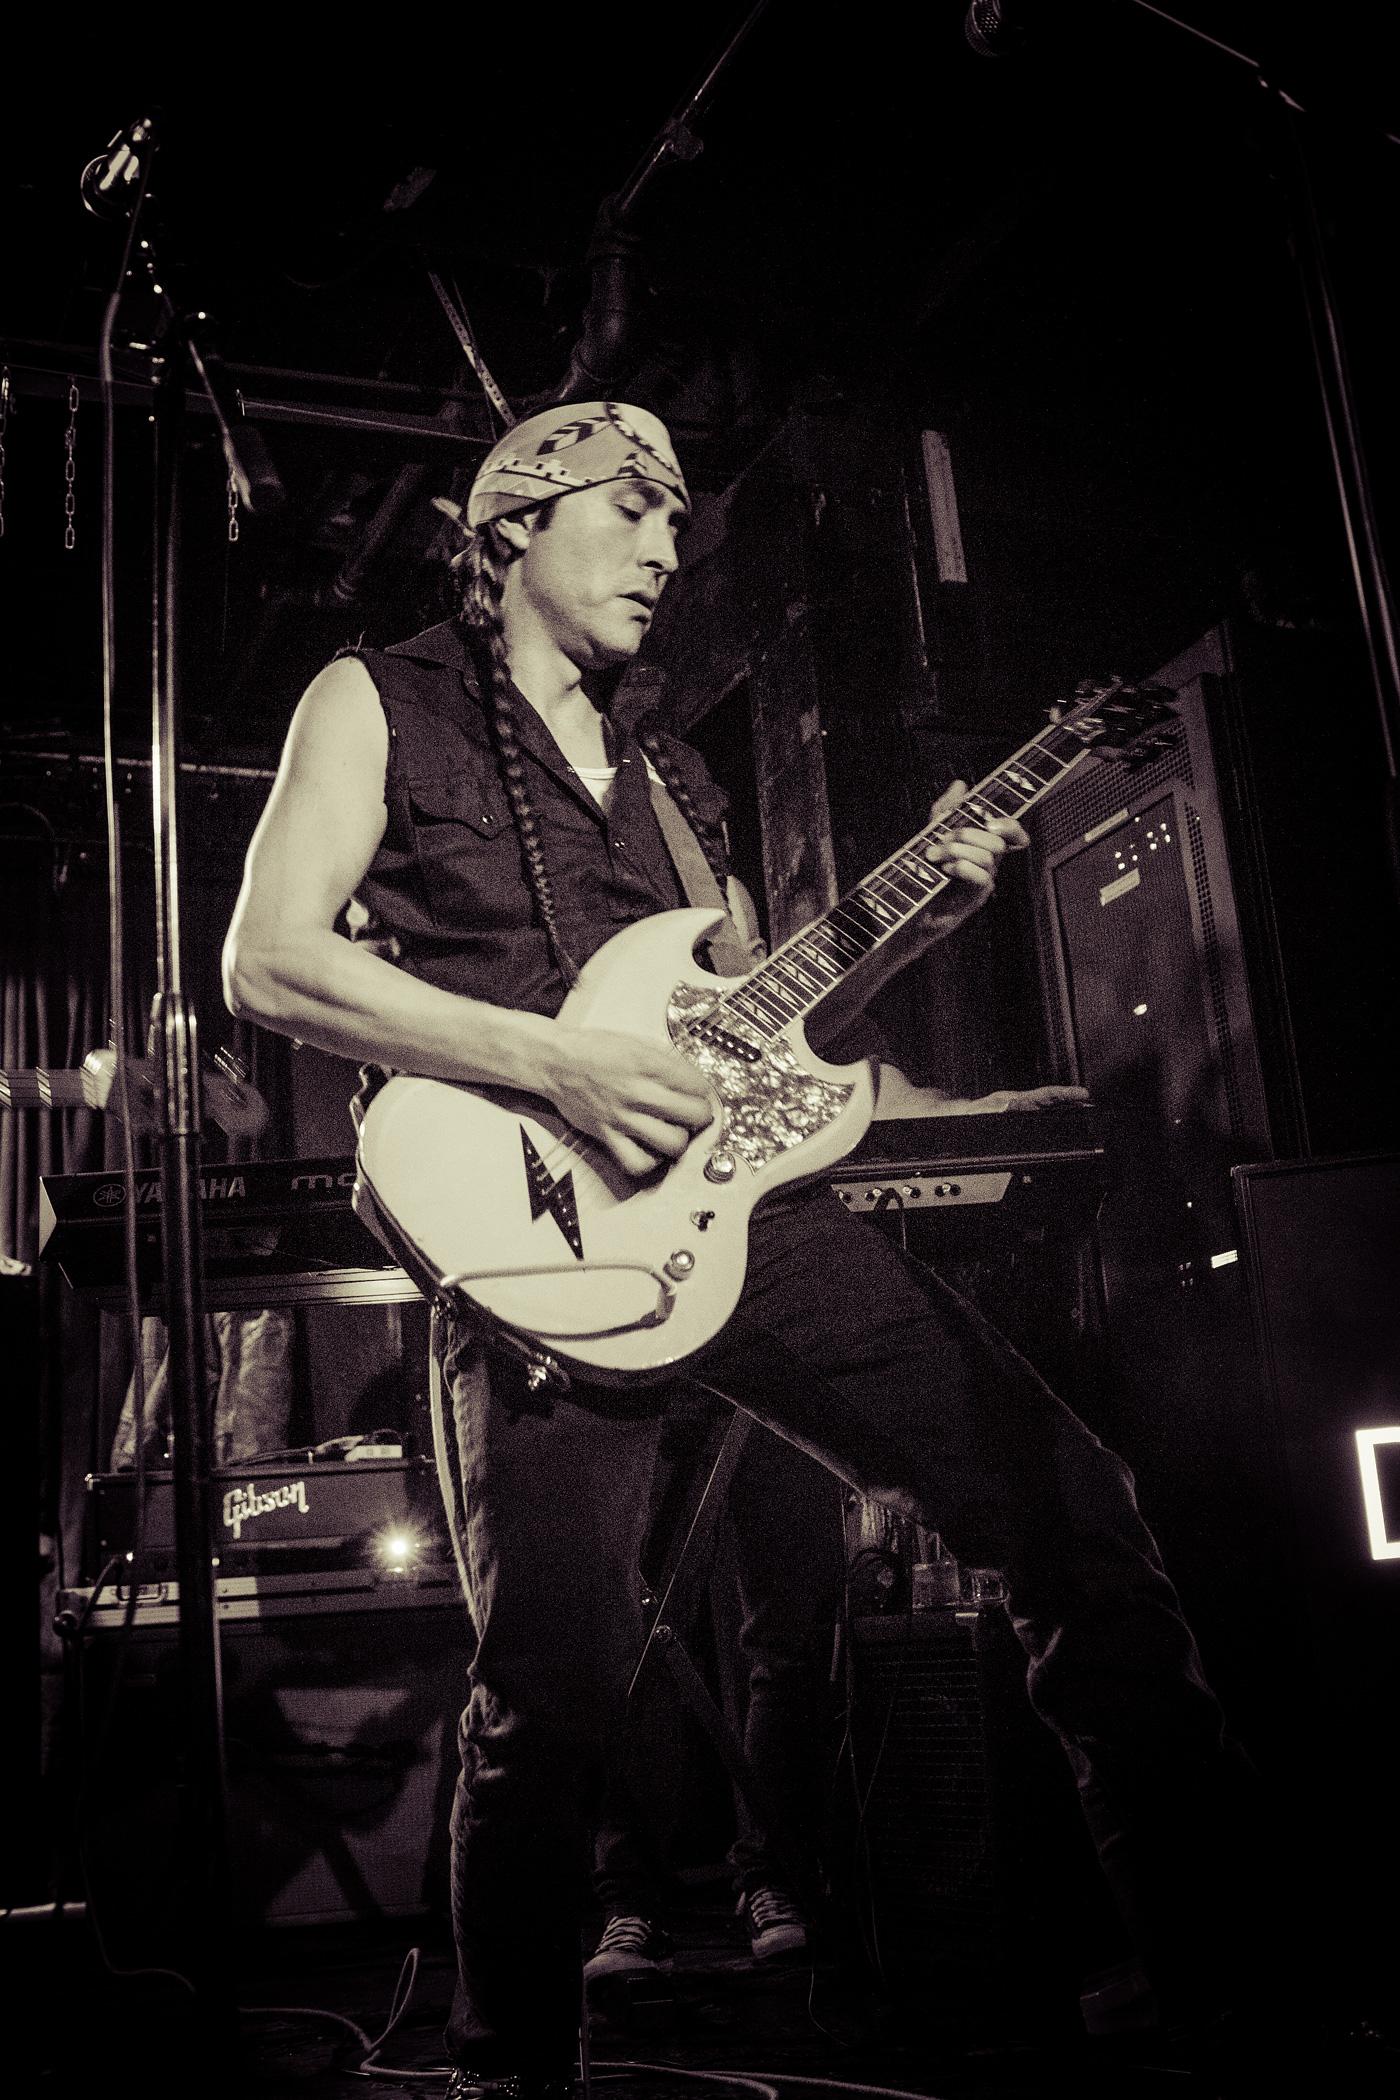 Decatur = Denver band concert photos